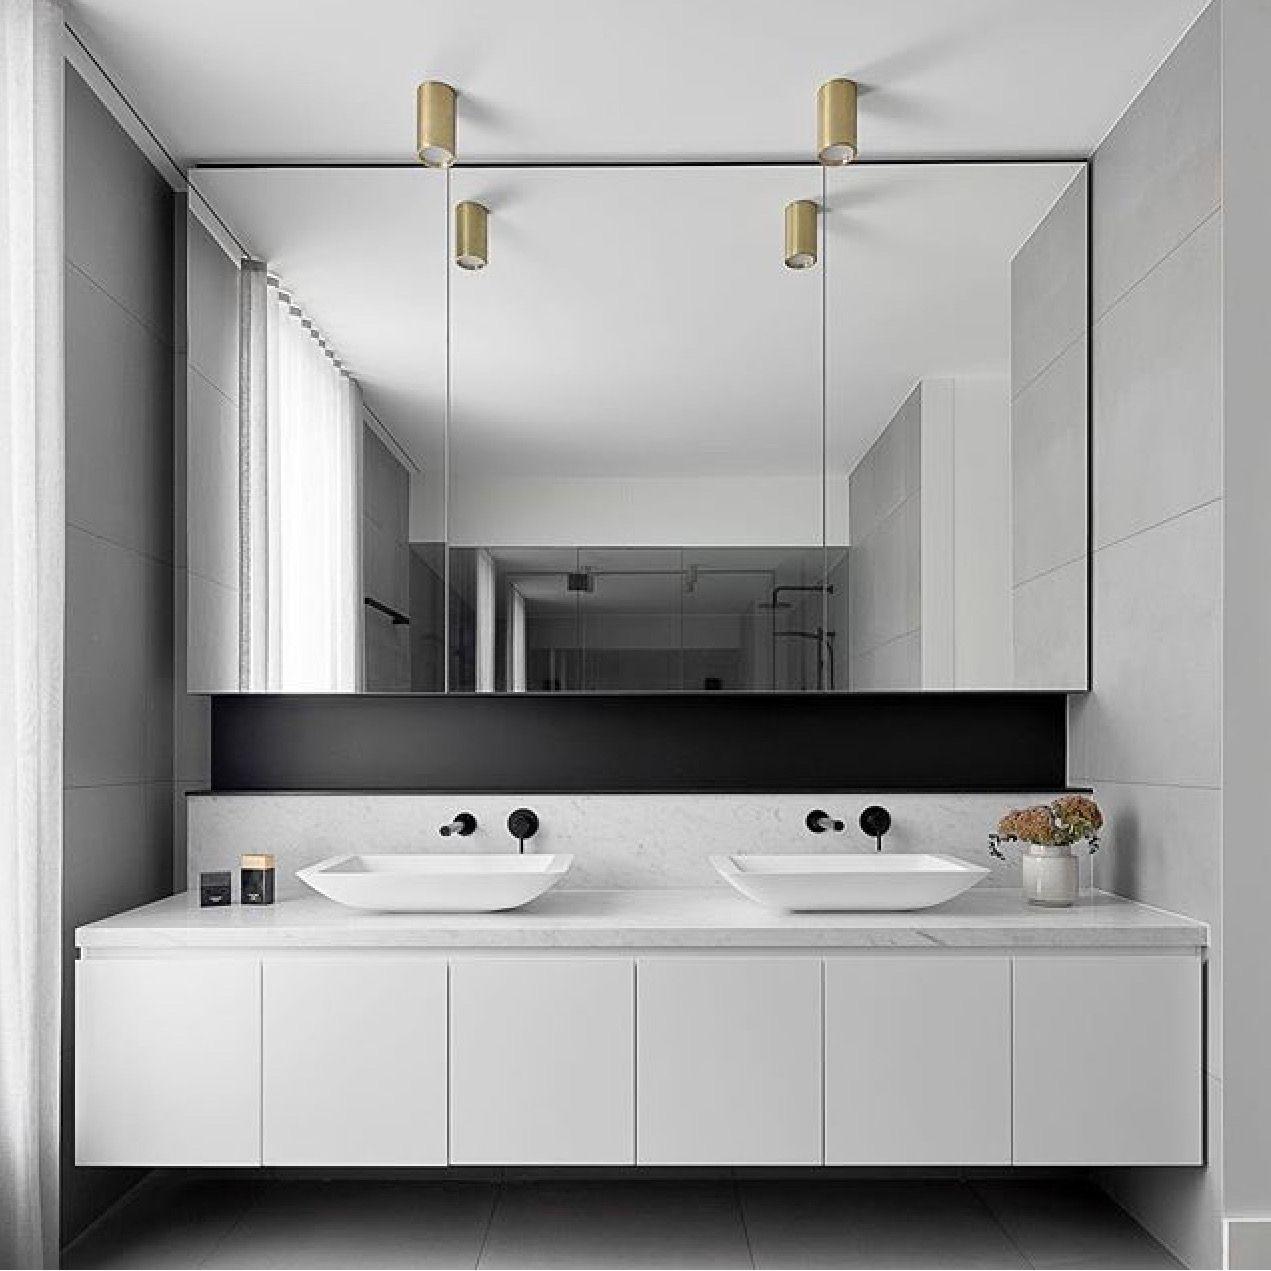 Modern Minimalist Bathroom Mirror: Modern Bathroom Basin Area. Bathroom